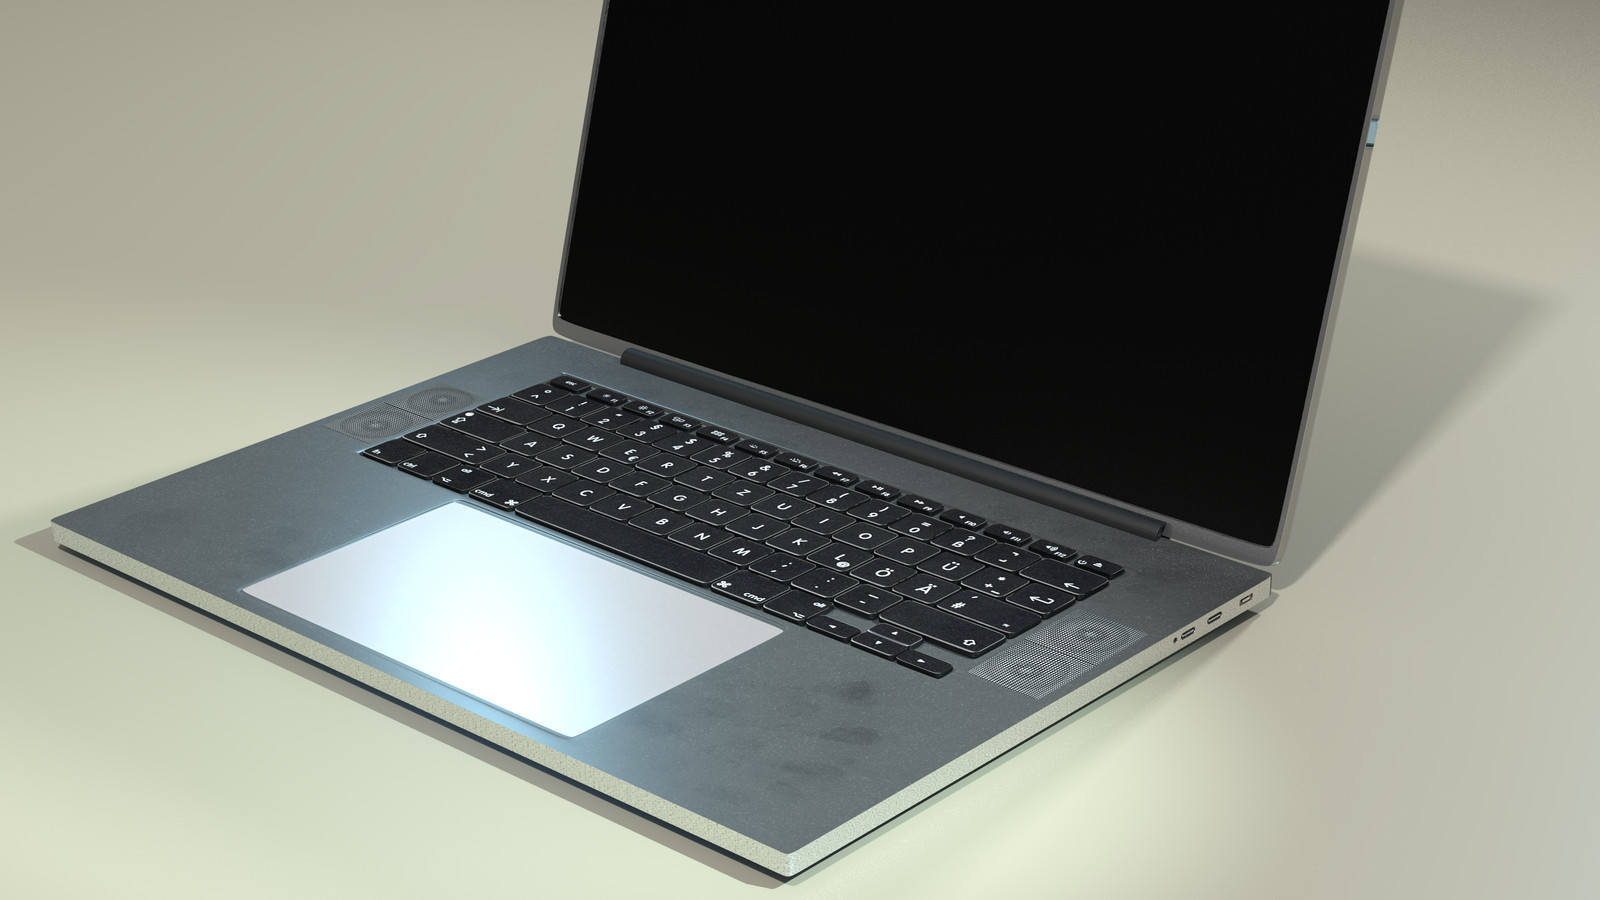 Original Laptop - Dusty